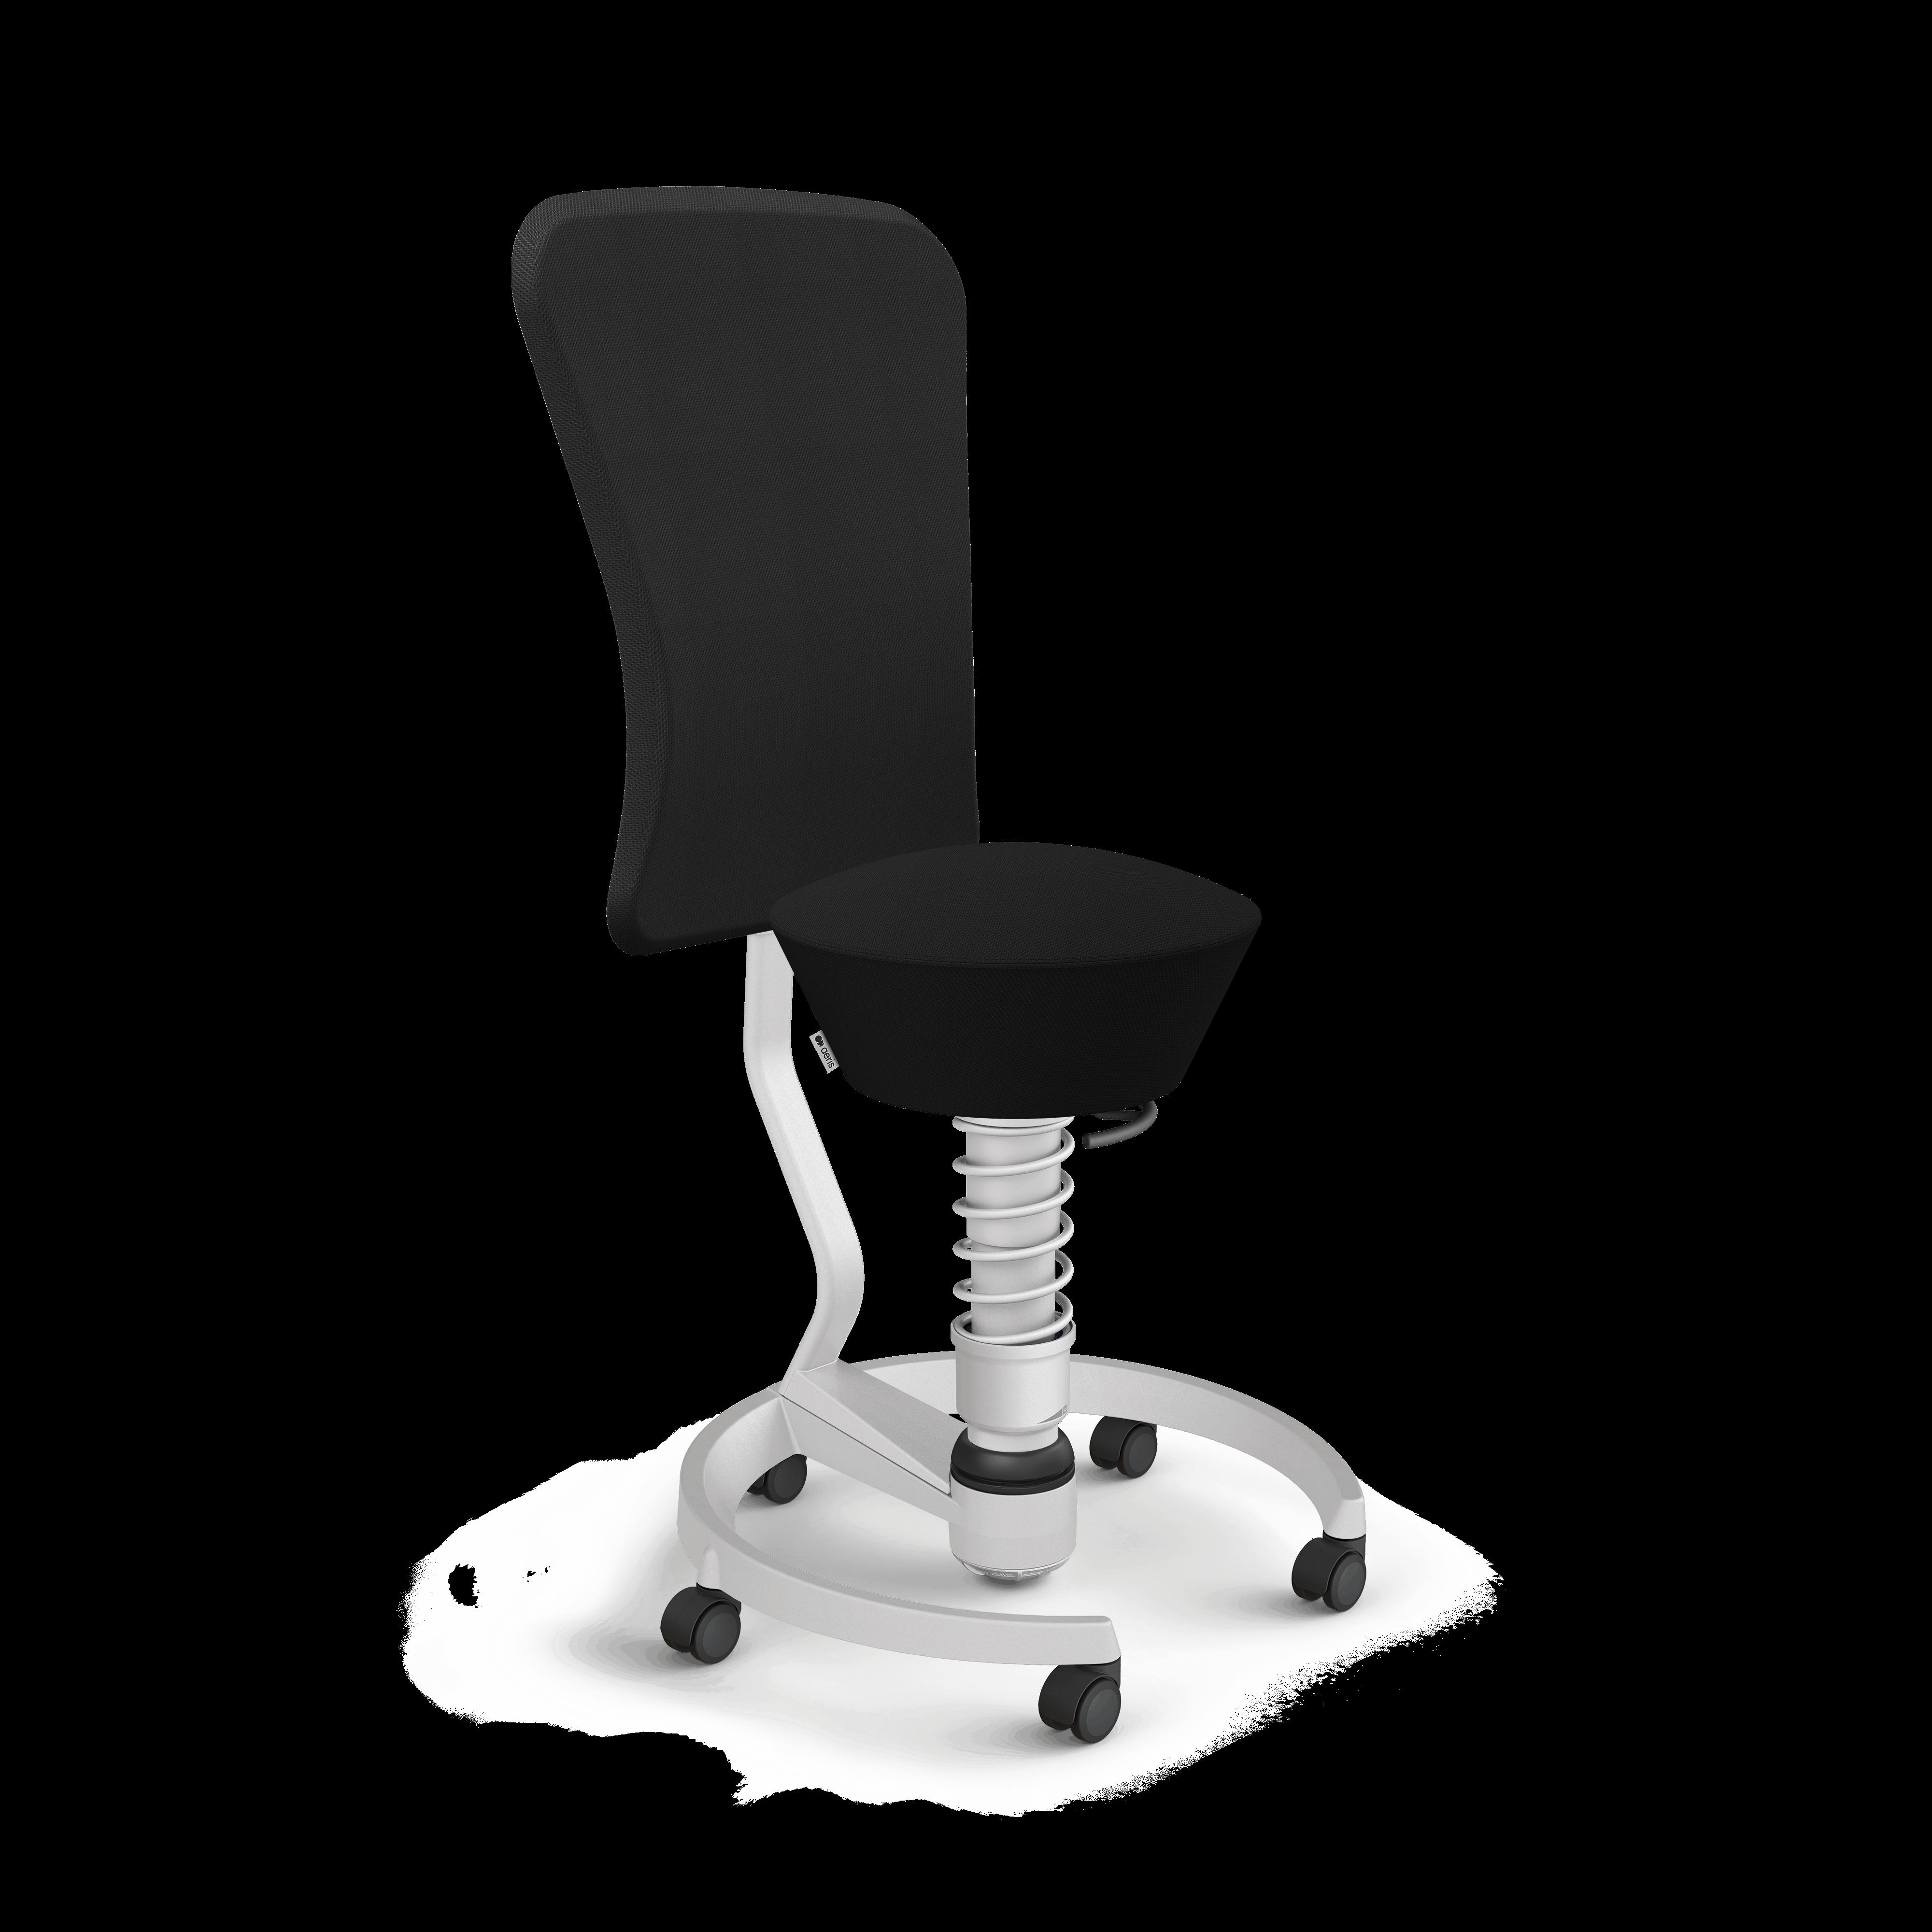 103 hb stlm lm se01 aeris swopper backrest castors hard floor standard light grey metallic light grey metallic select black 01